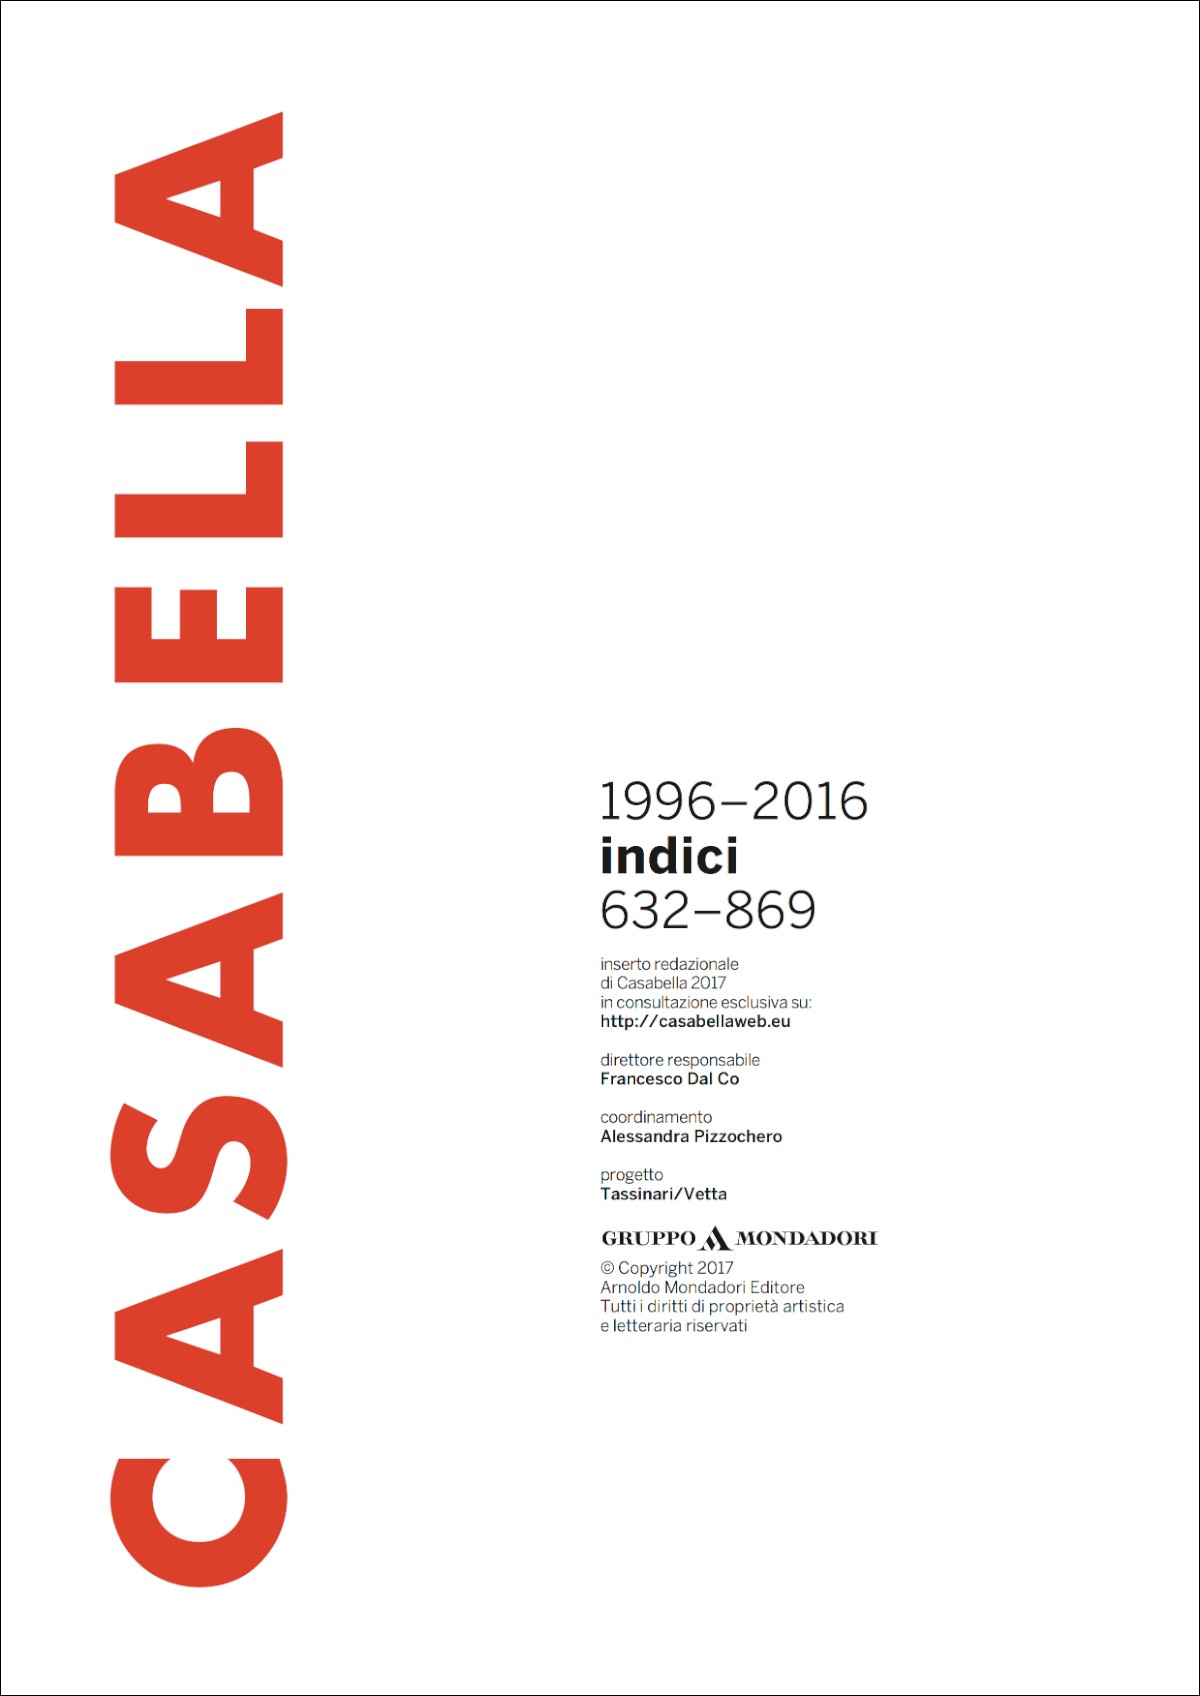 indici CASABELLA 1996-2016